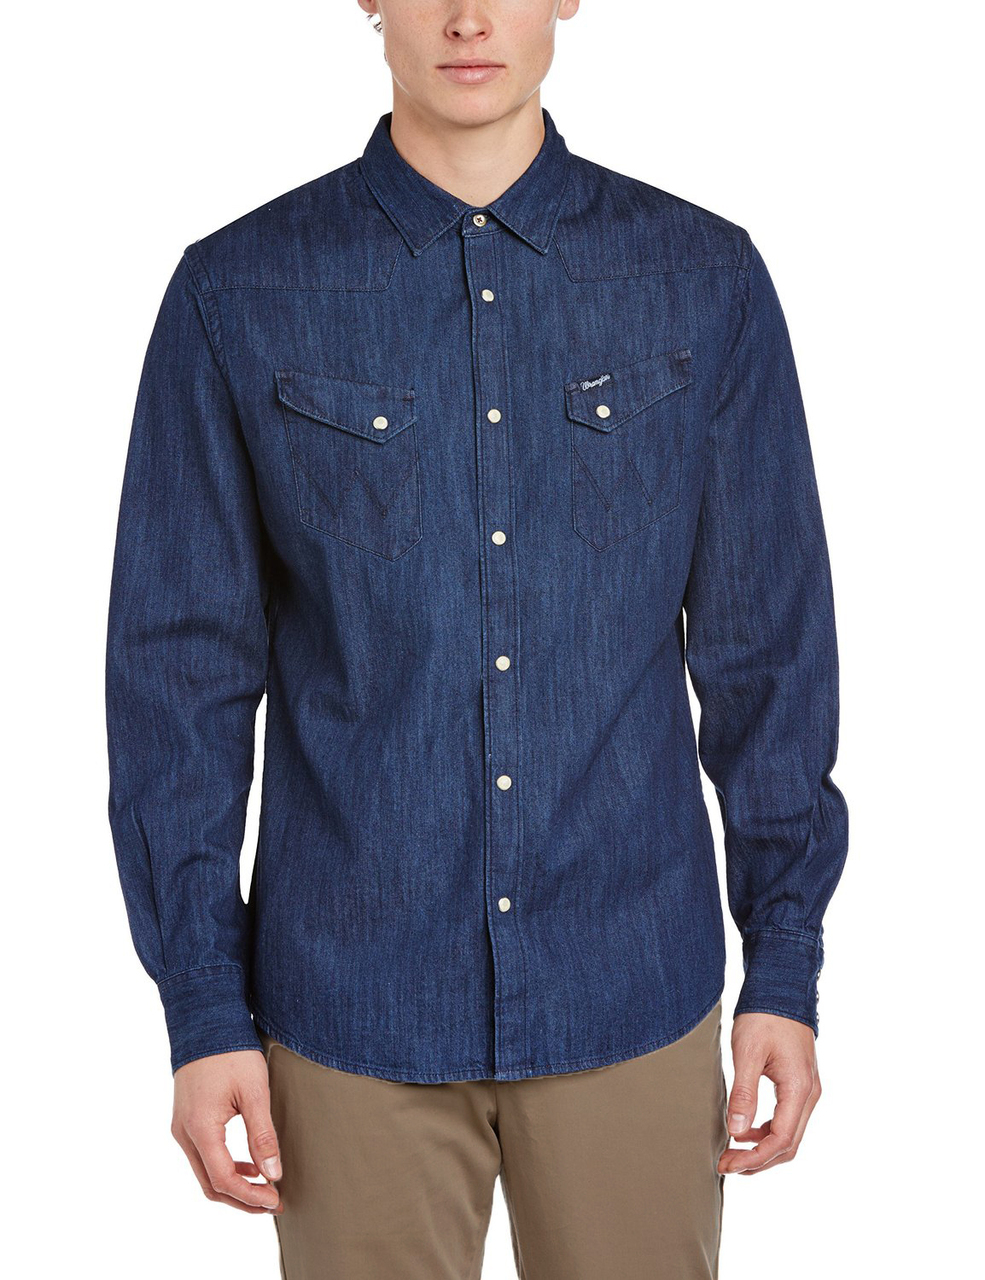 Wrangler denim shirt long sleeve western dark indigo blue for Wrangler denim shirts uk